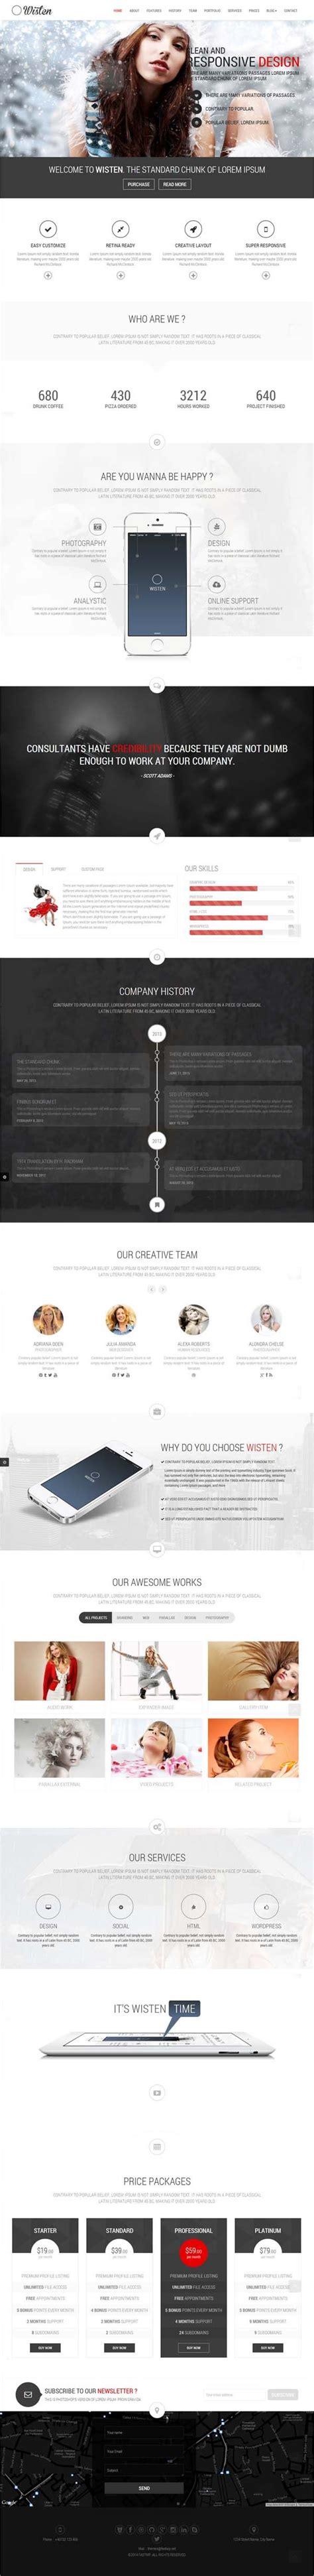 design inspiration wordpress wisten wordpress one page parallax theme wordpress